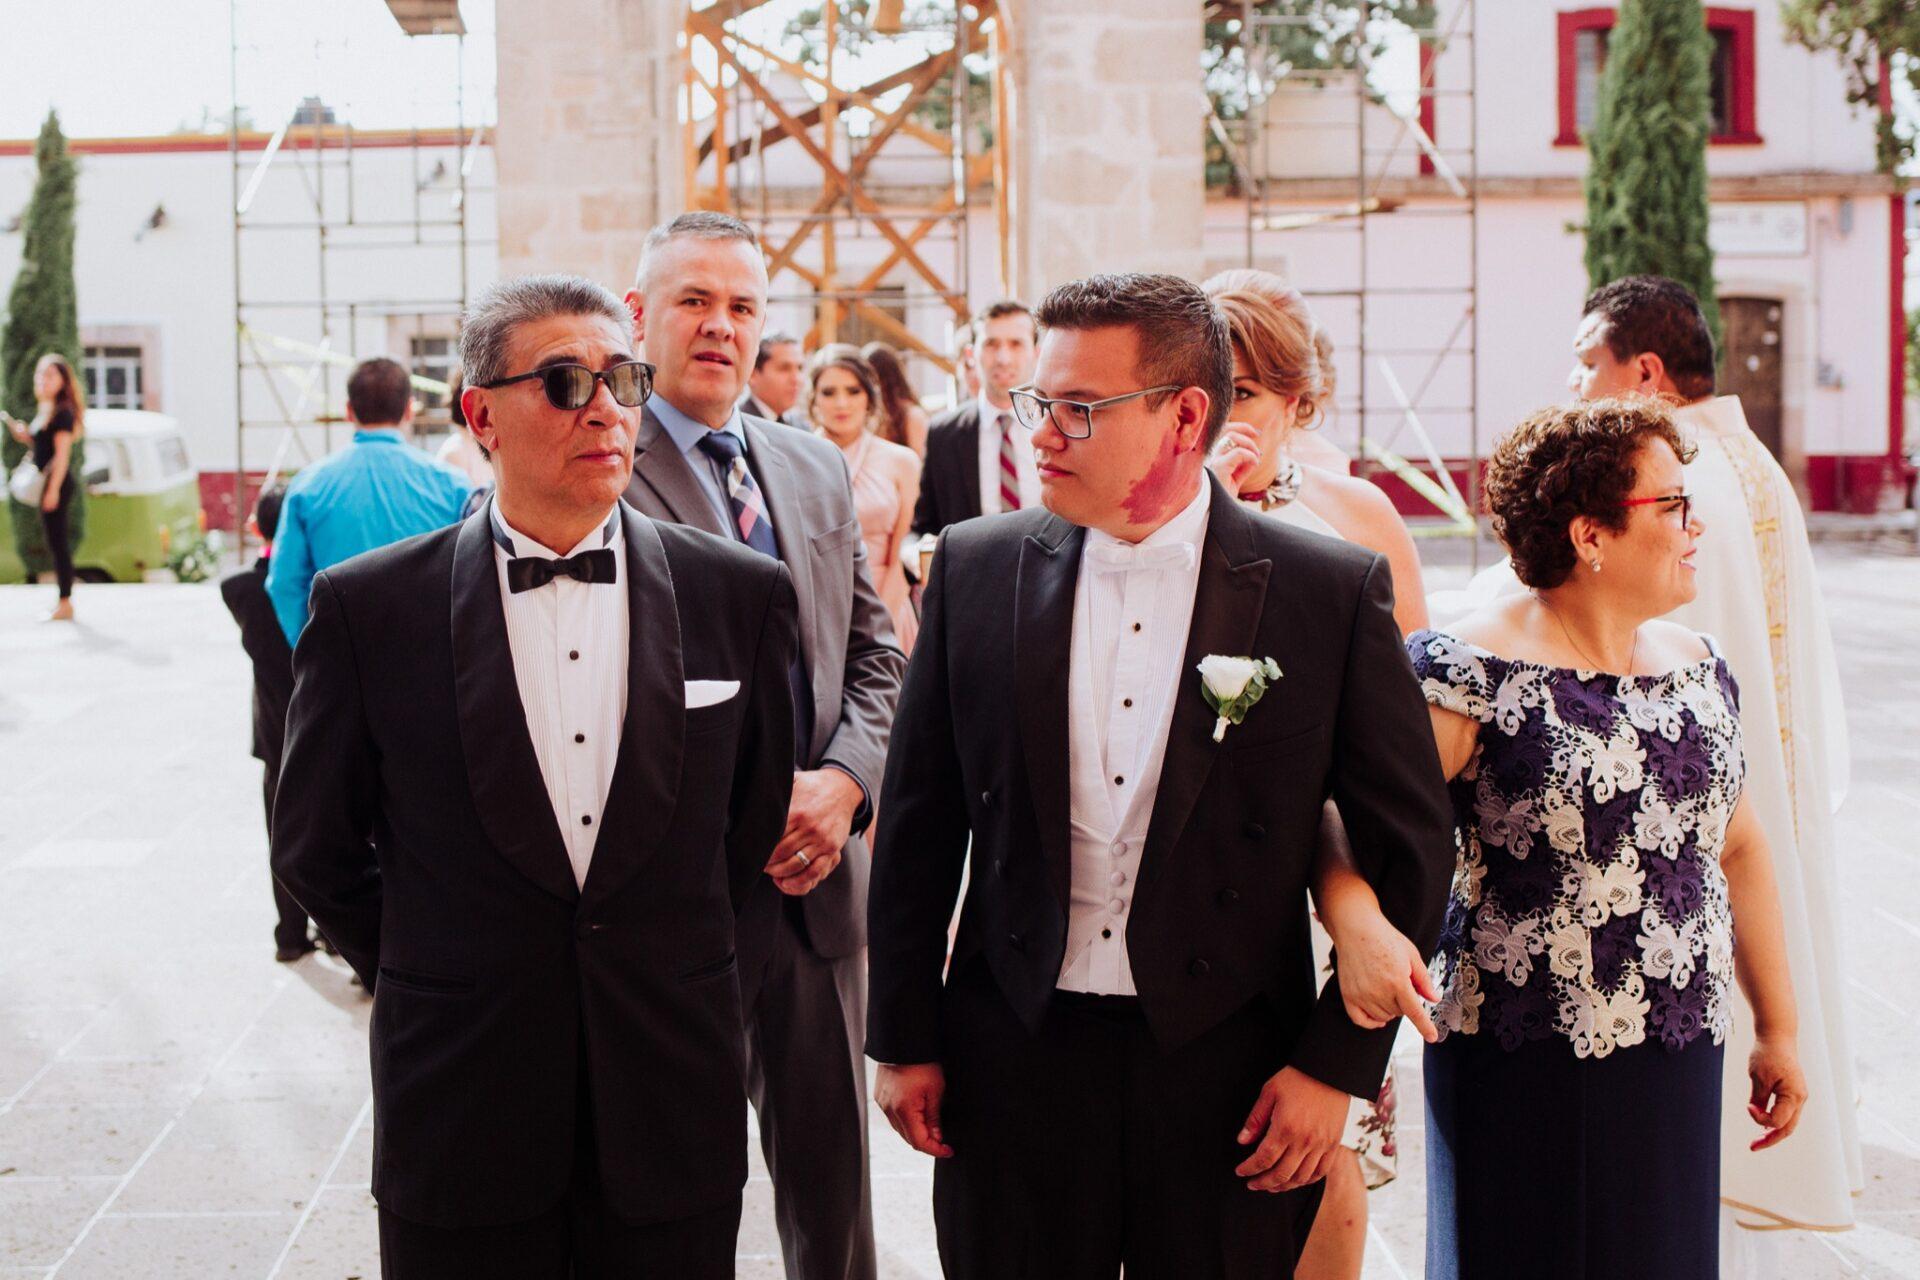 javier_noriega_fotografo_bodas_teul_zacatecas_wedding_photographer4a